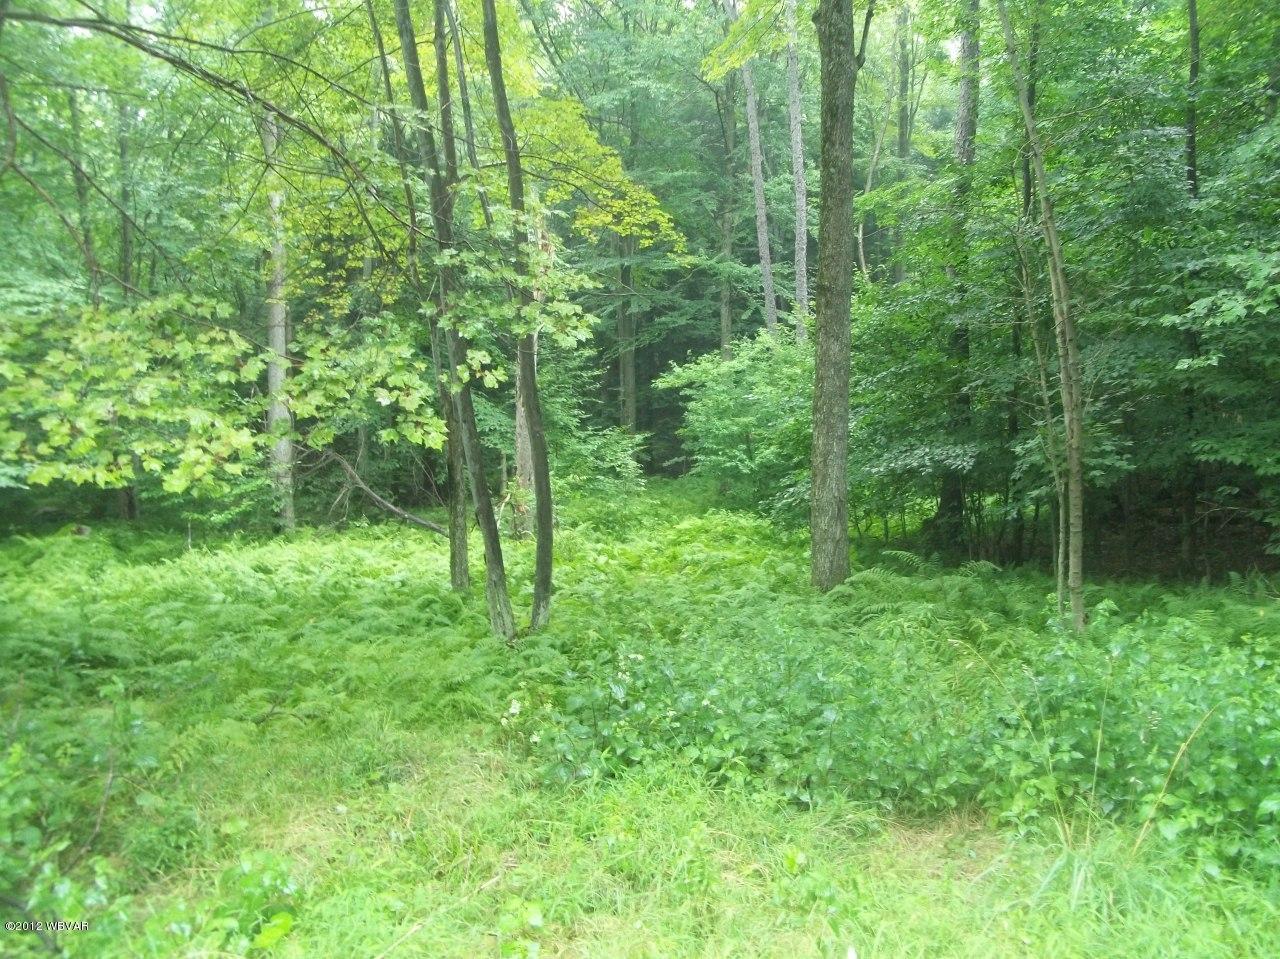 LOT 23 HILARY LANE, Laporte, PA 18626, ,Land,For sale,HILARY,WB-65317